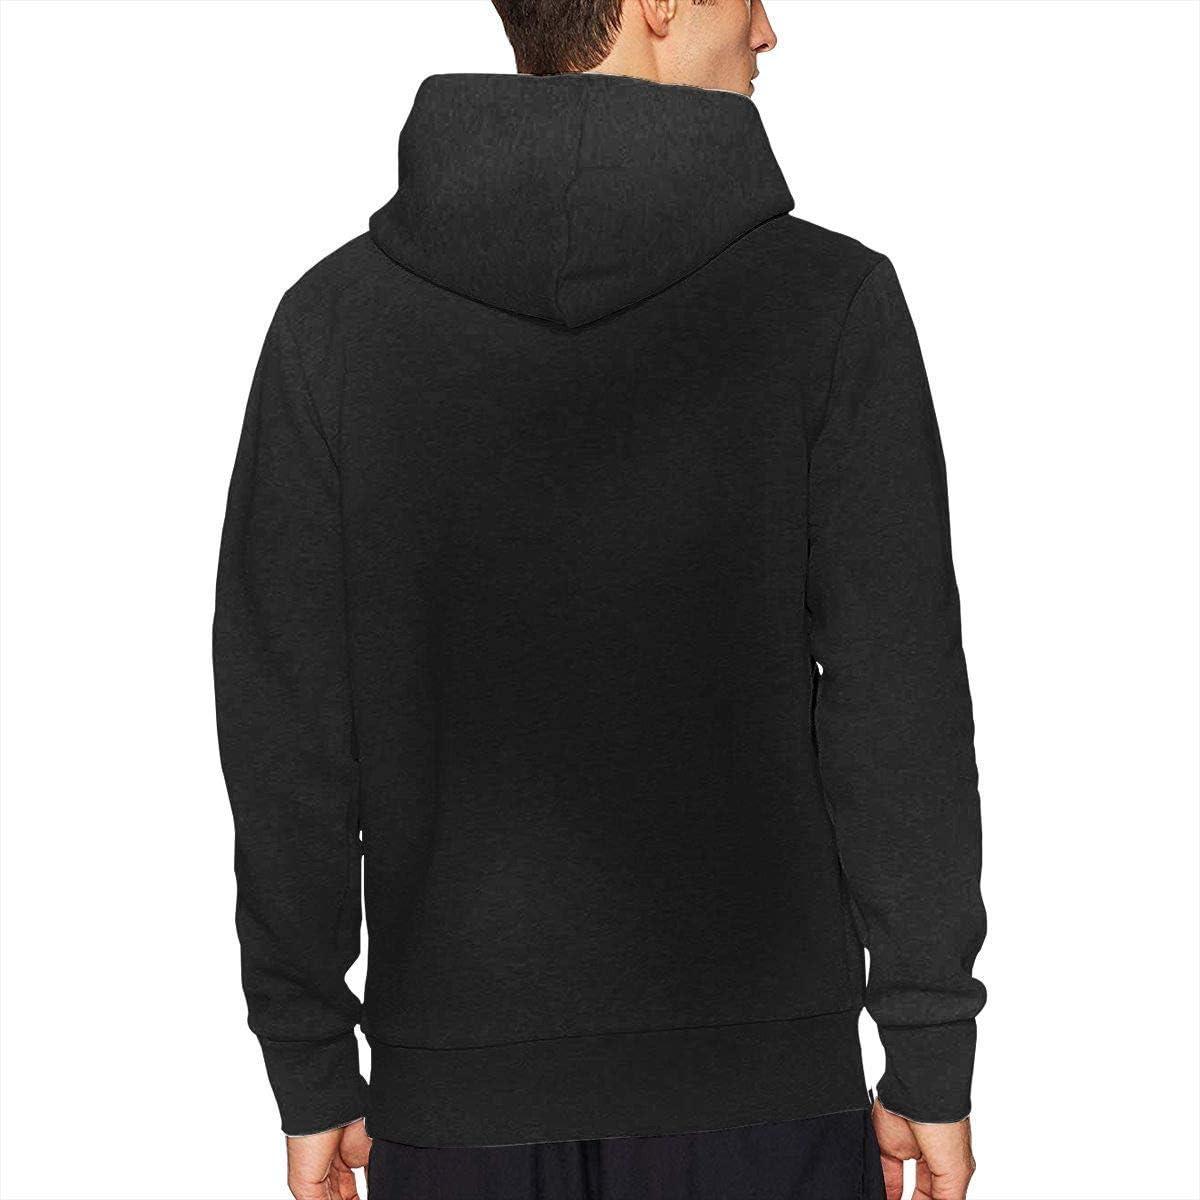 JosephineGrimes Unisex Kanye West Graduation Casual Hoodie Mens 3D Printed Sweatshirts Women Pullover Sweatshirt